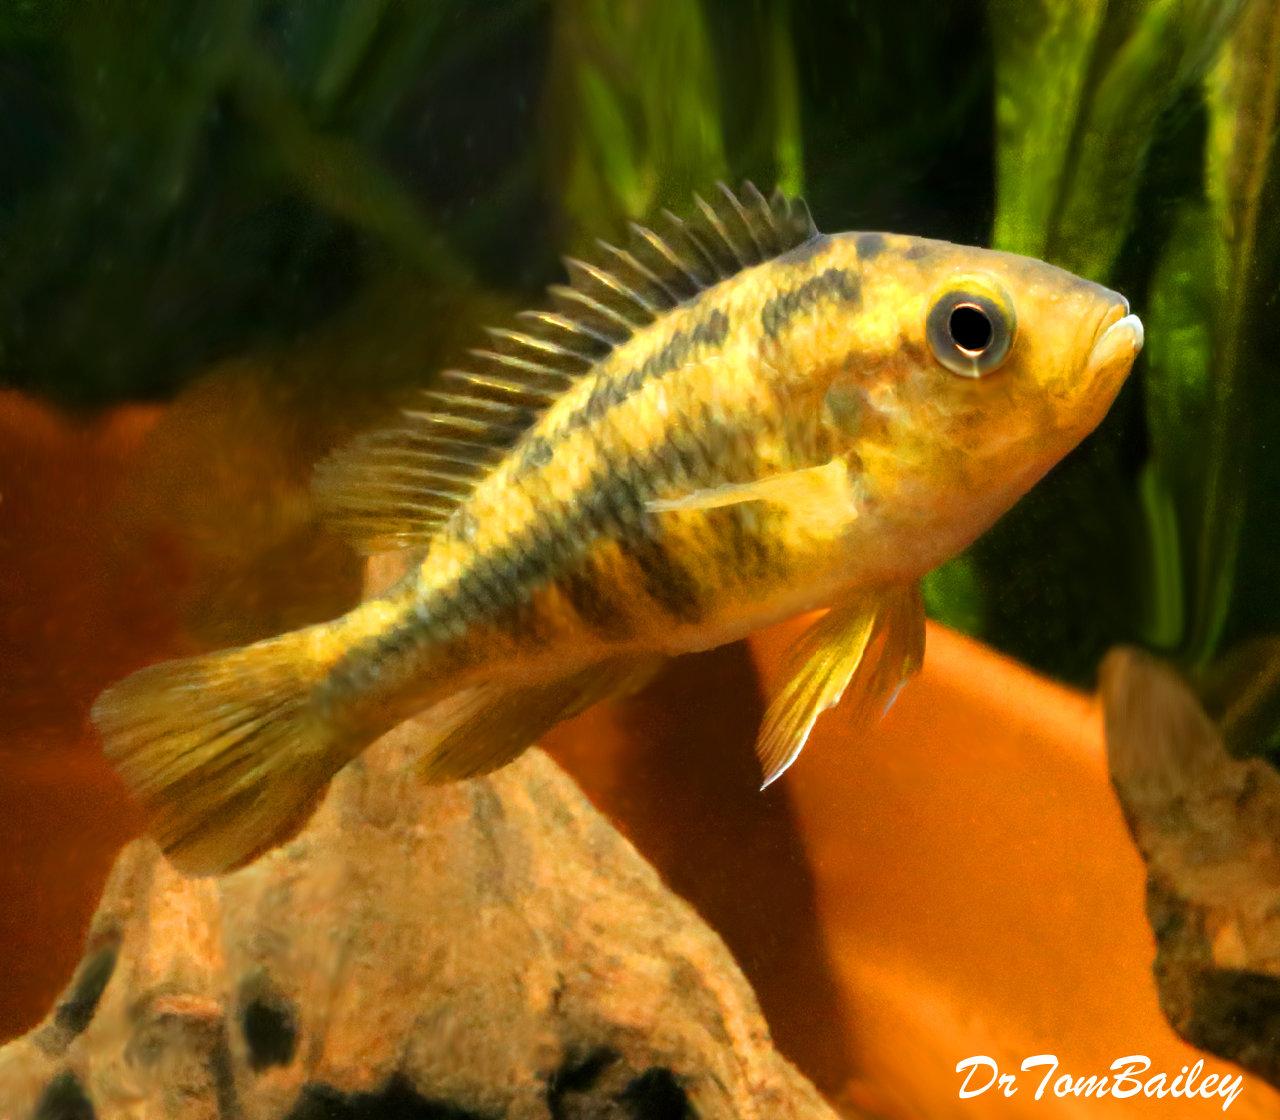 "Premium Lake Victoria Yellow Rock Kribensis Cichlid, 2.5"" to 3"" long"